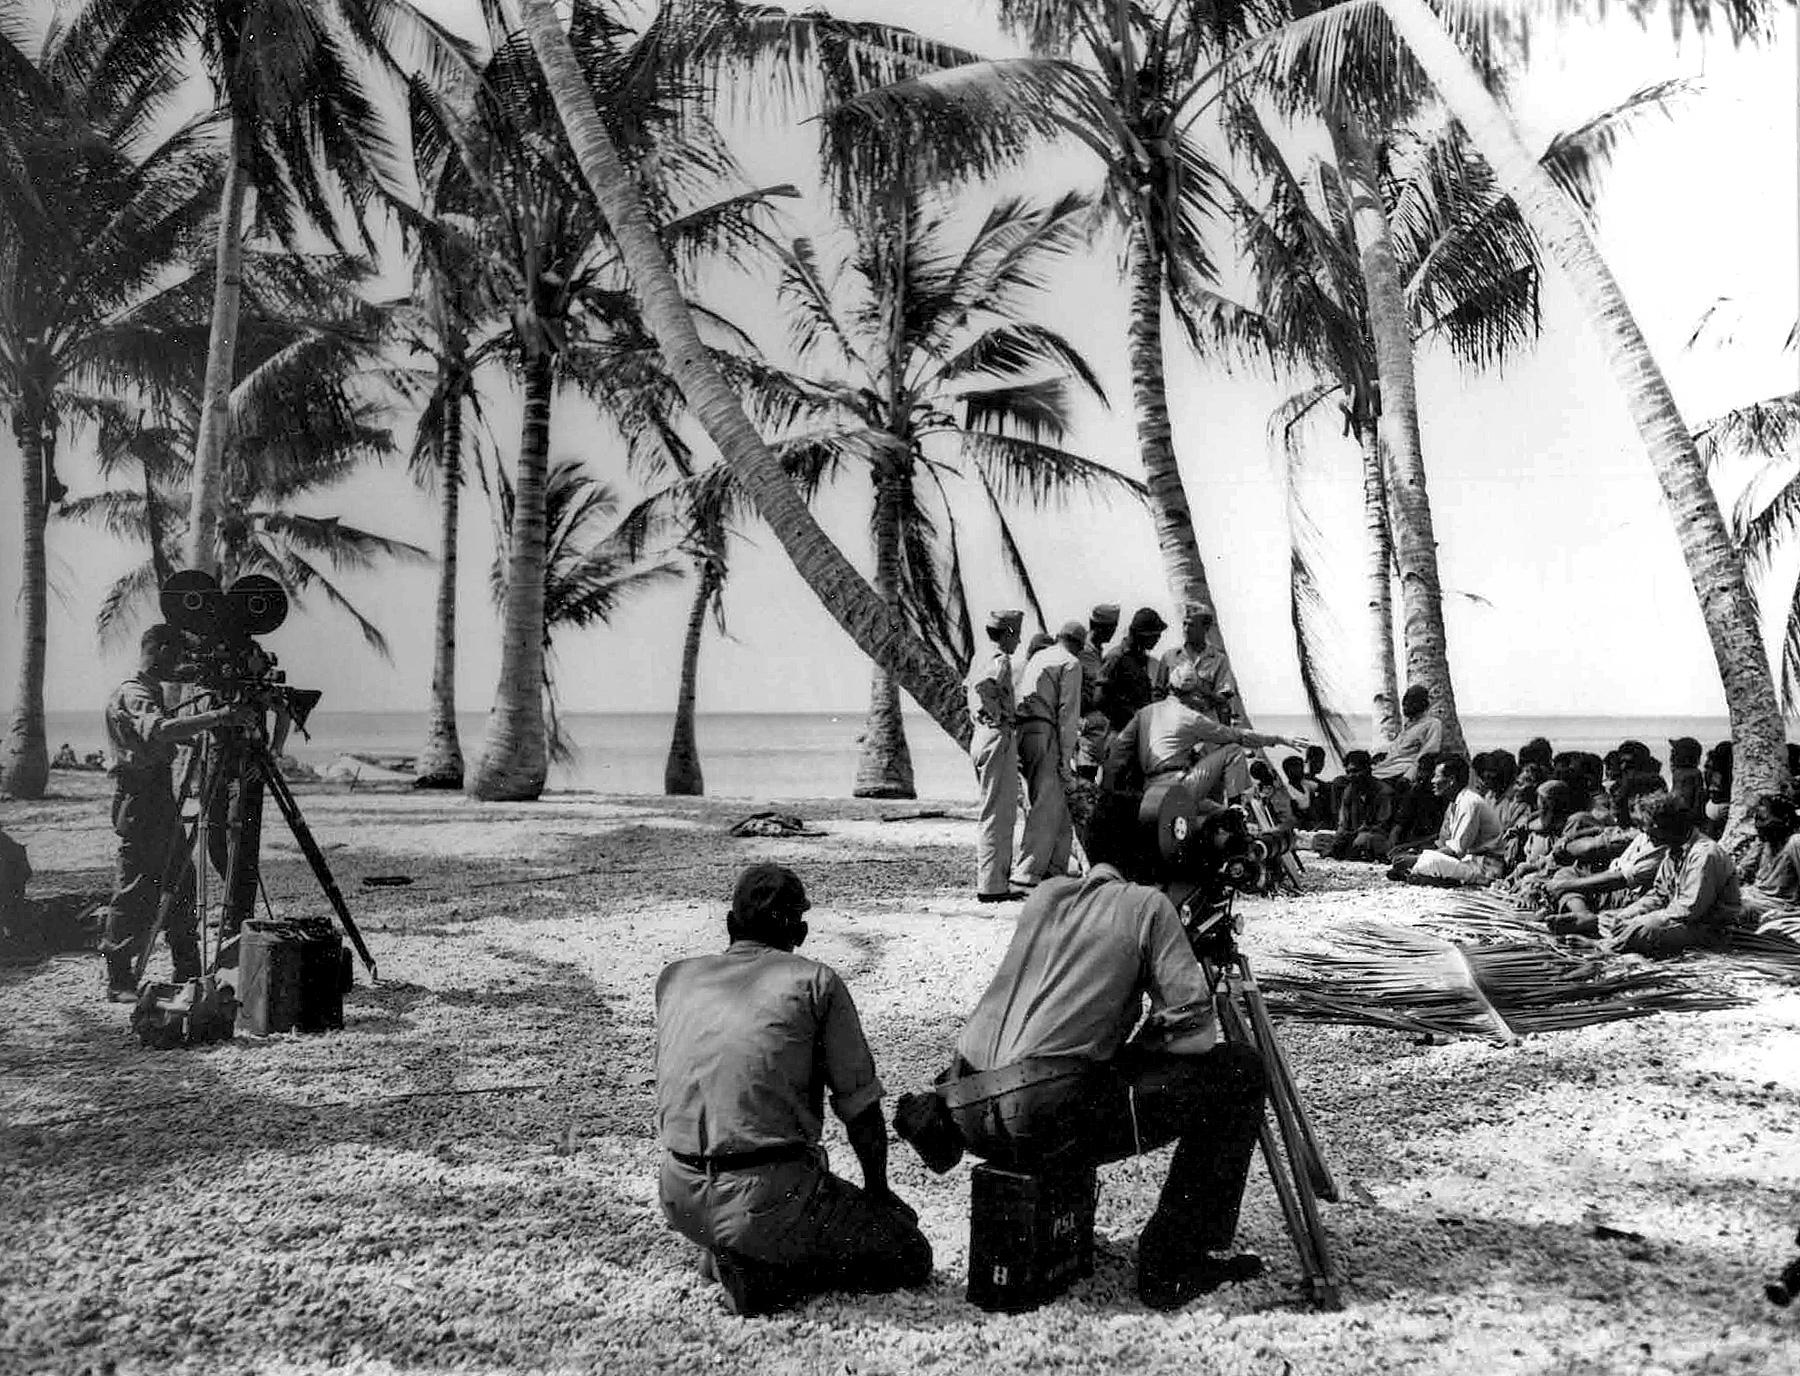 Operation-Crossroads-Bikini-Atoll.jpg